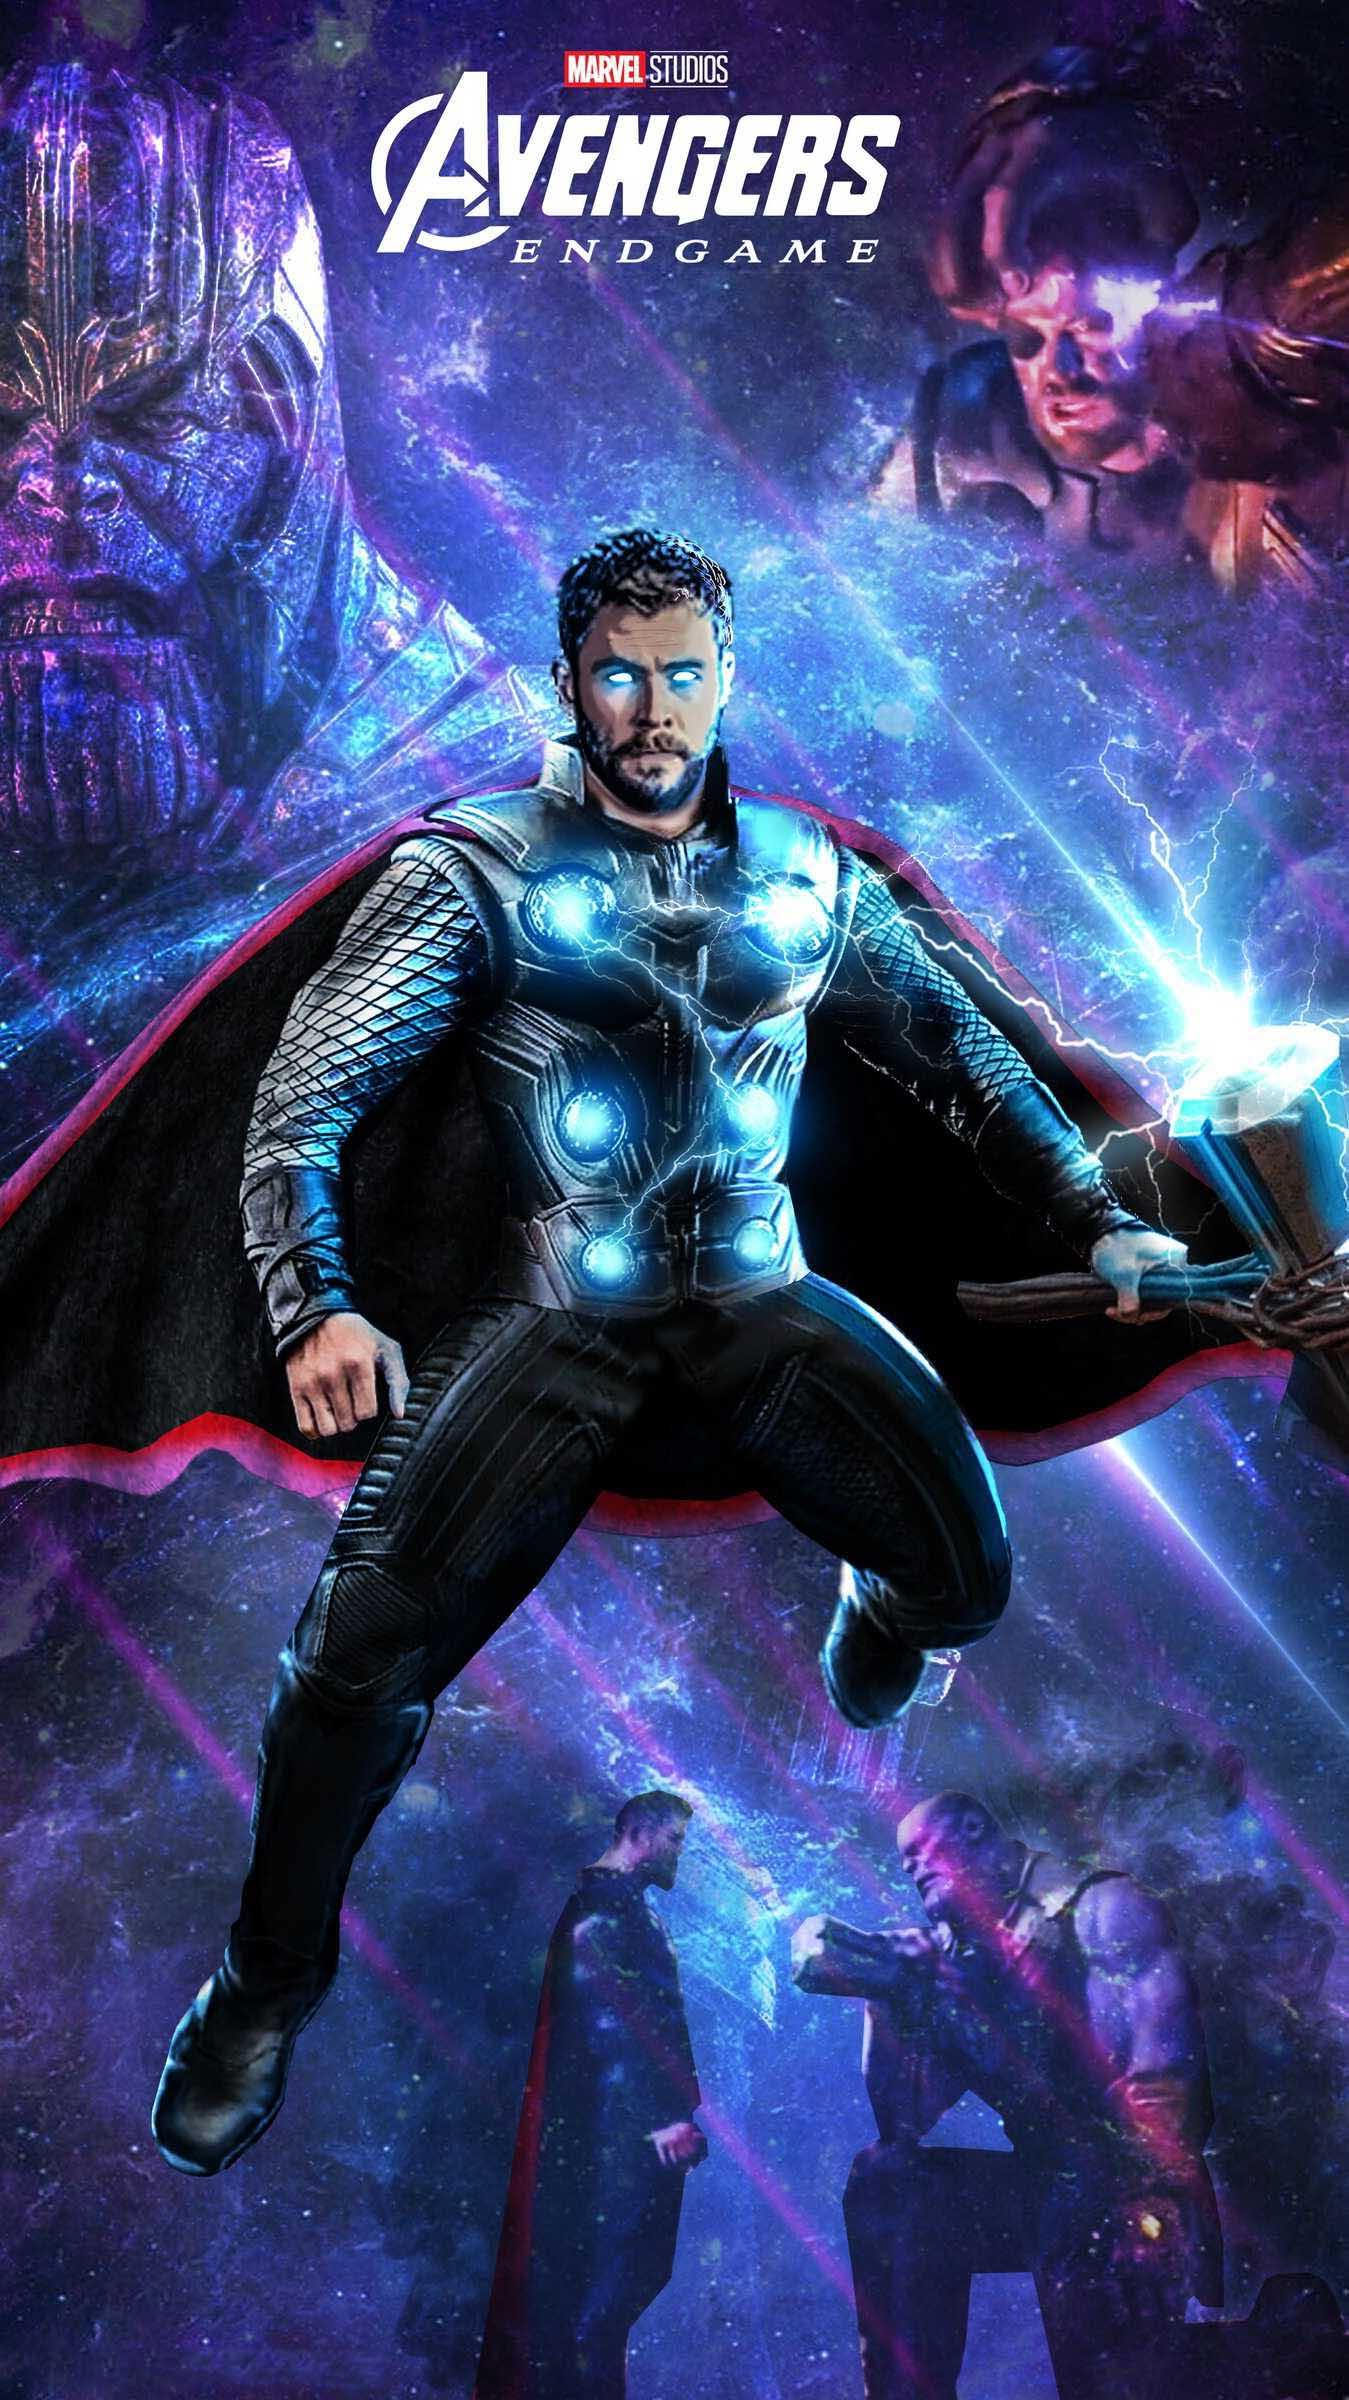 Avengers Endgame Thanos vs Thor iPhone Wallpaper - iPhone